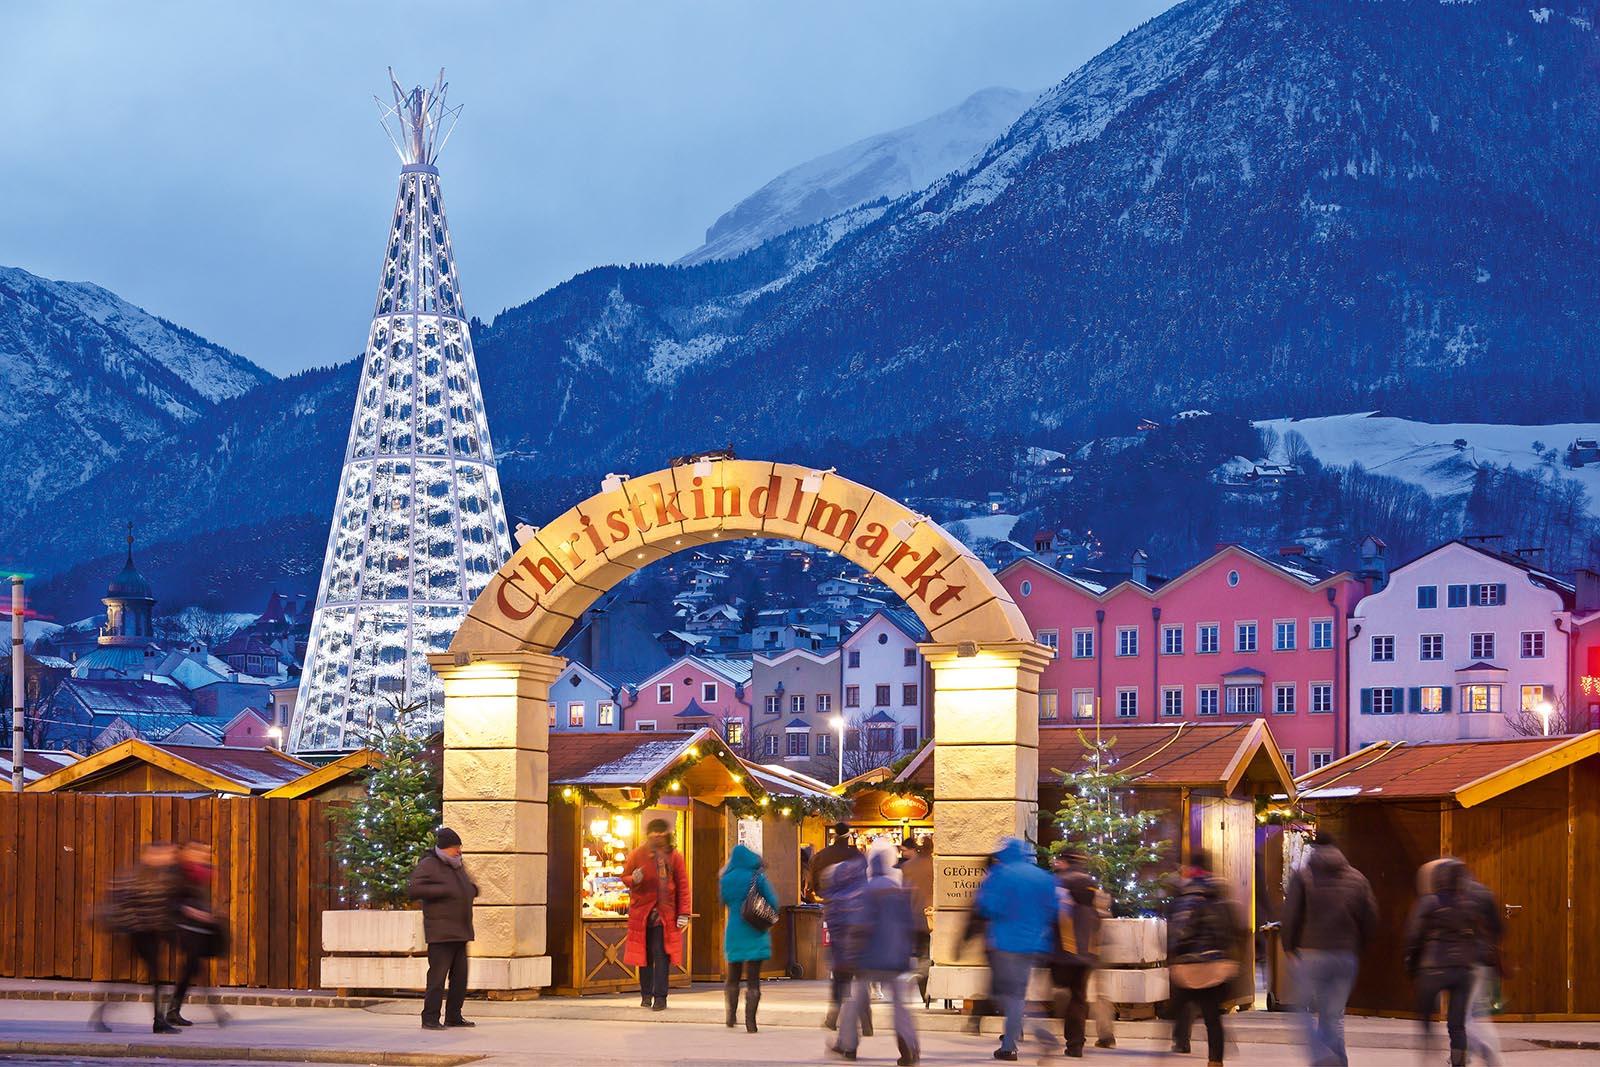 Immagini Mercatini Di Natale Innsbruck.Natale A Innsbruck Con I Bambini Tra Mercatini E Cantastorie